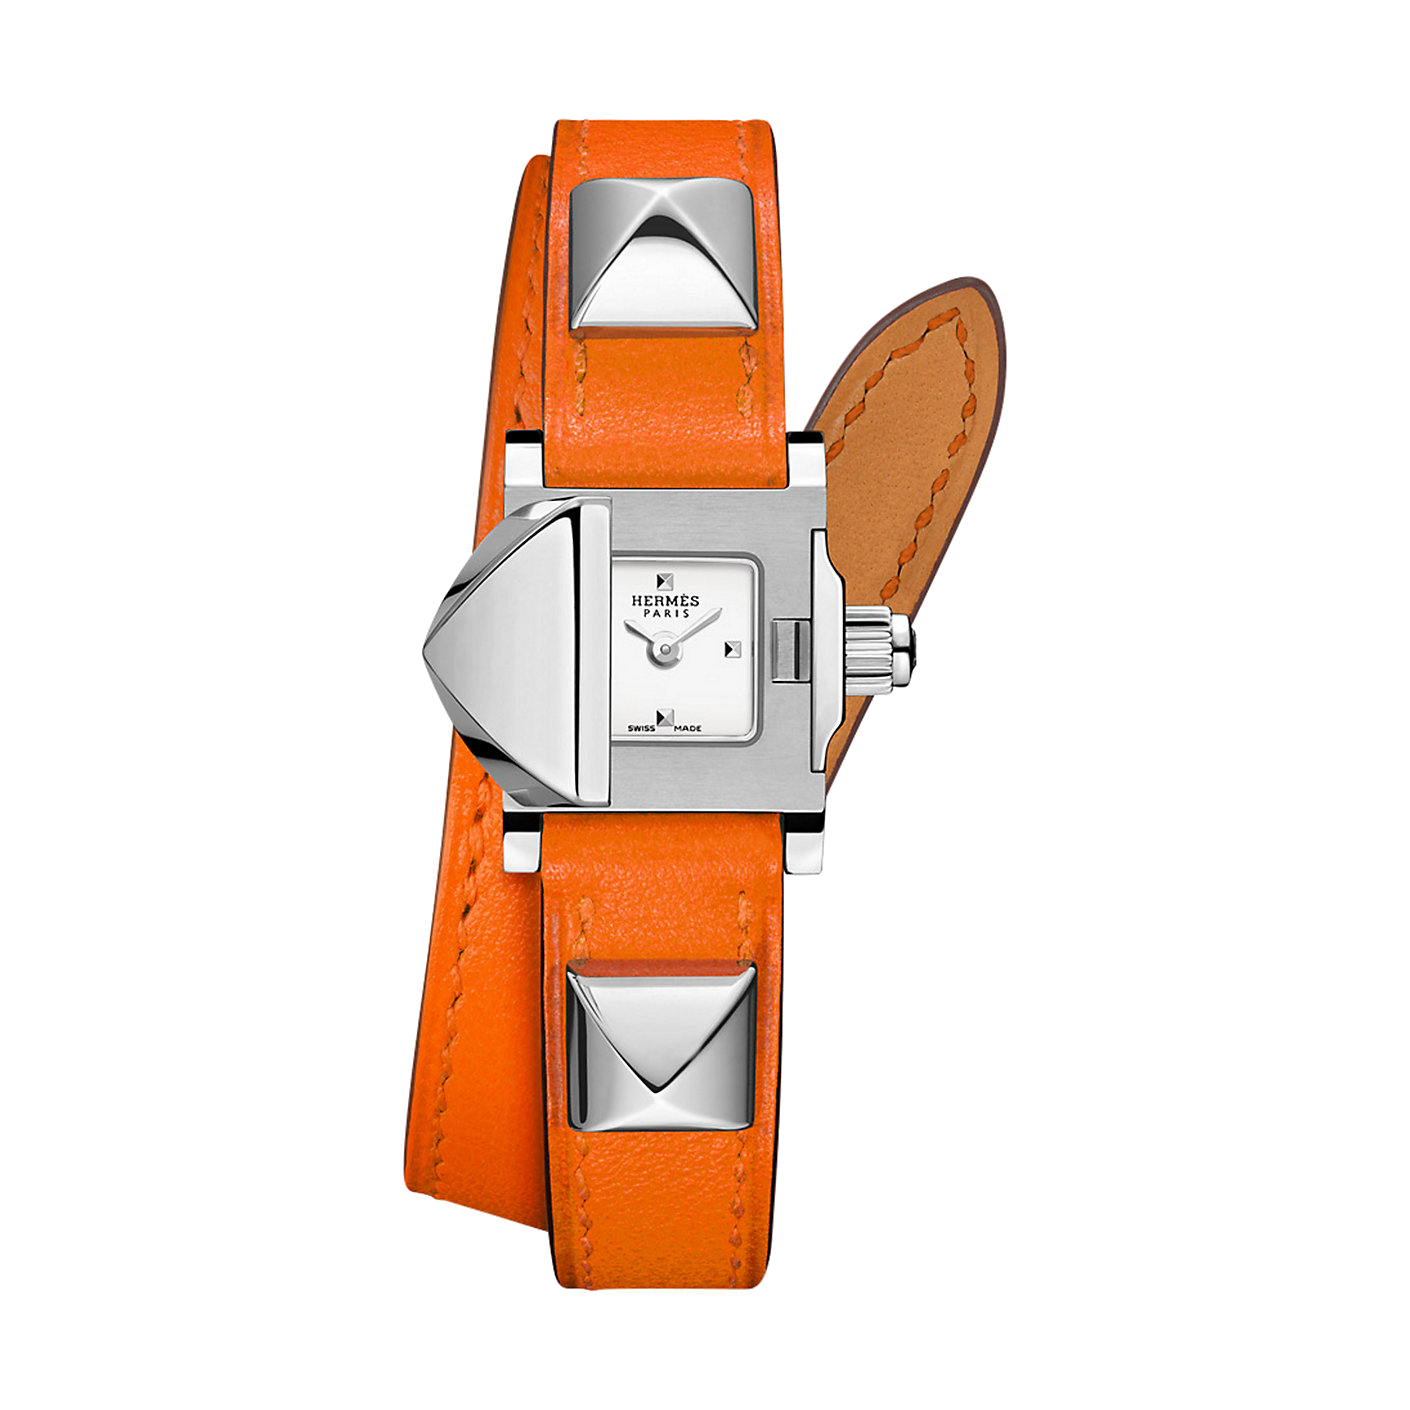 Hermès-medor-16-x-16mm-Hall-of-Time-035597WW00